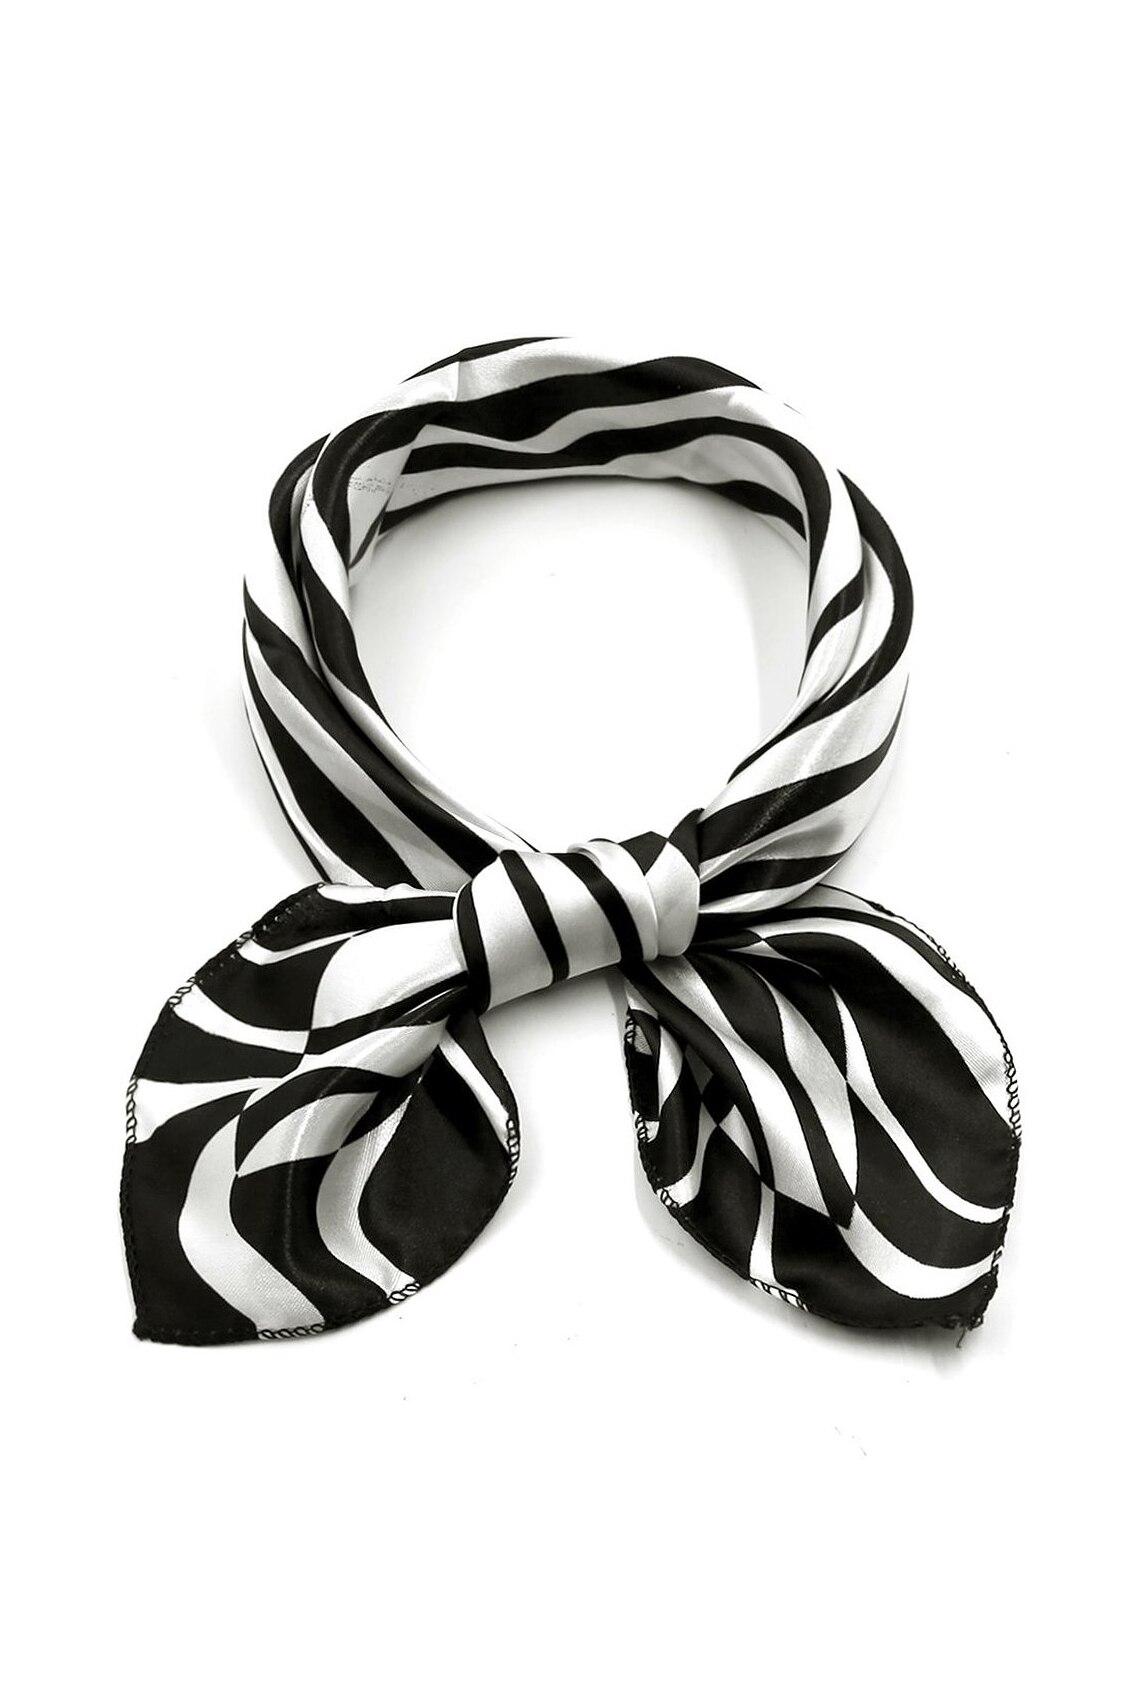 ᗔSAF-impresión poliéster 20 pañuelo Masajeadores de cuello bufanda ...